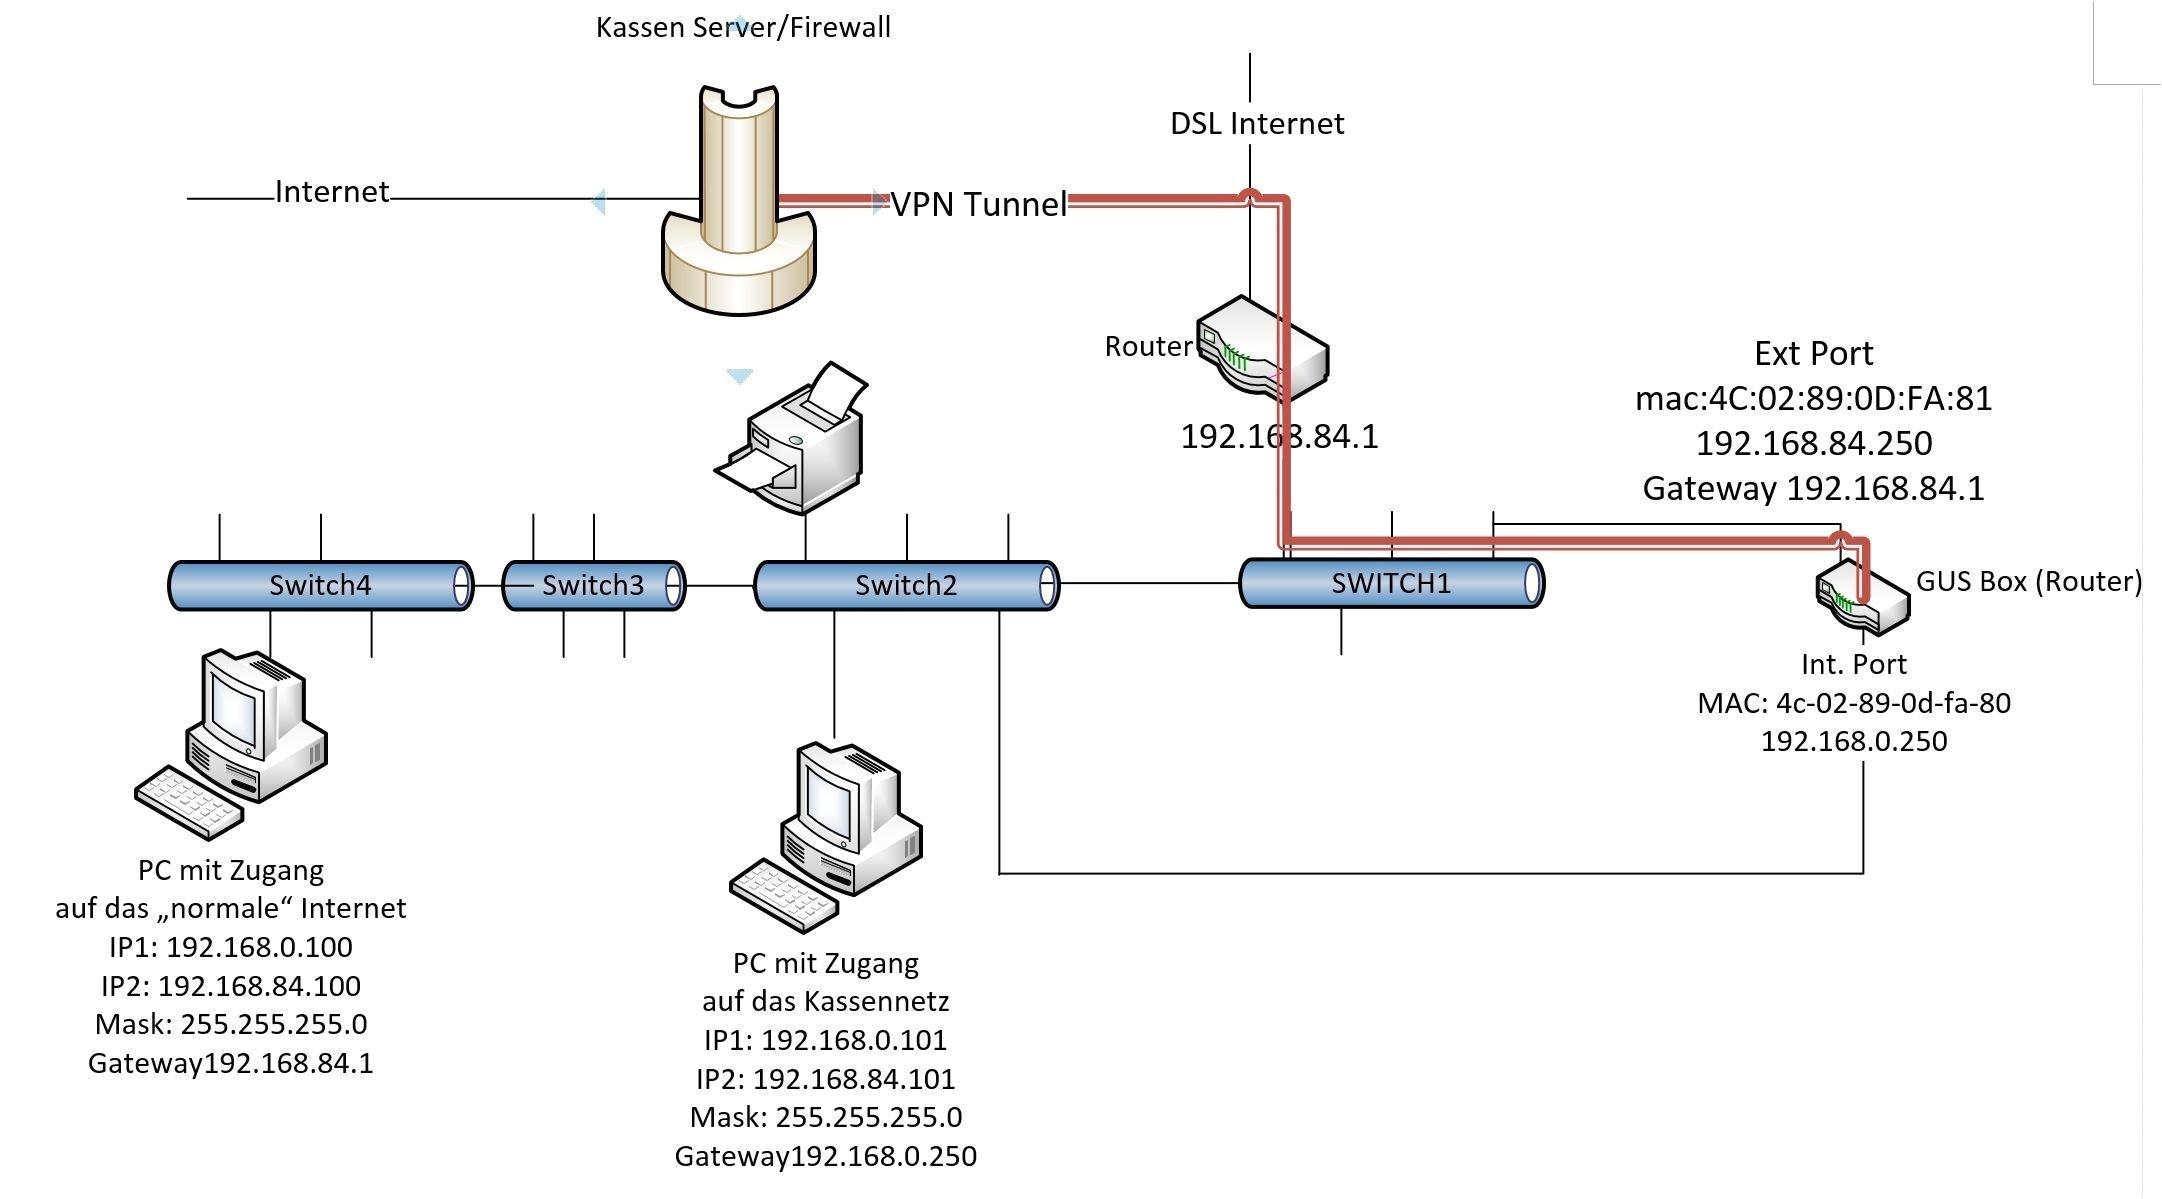 wiring diagram guitar gk007m wiring diagram go guitar wiring diagram editor wiring diagram paper wiring diagram